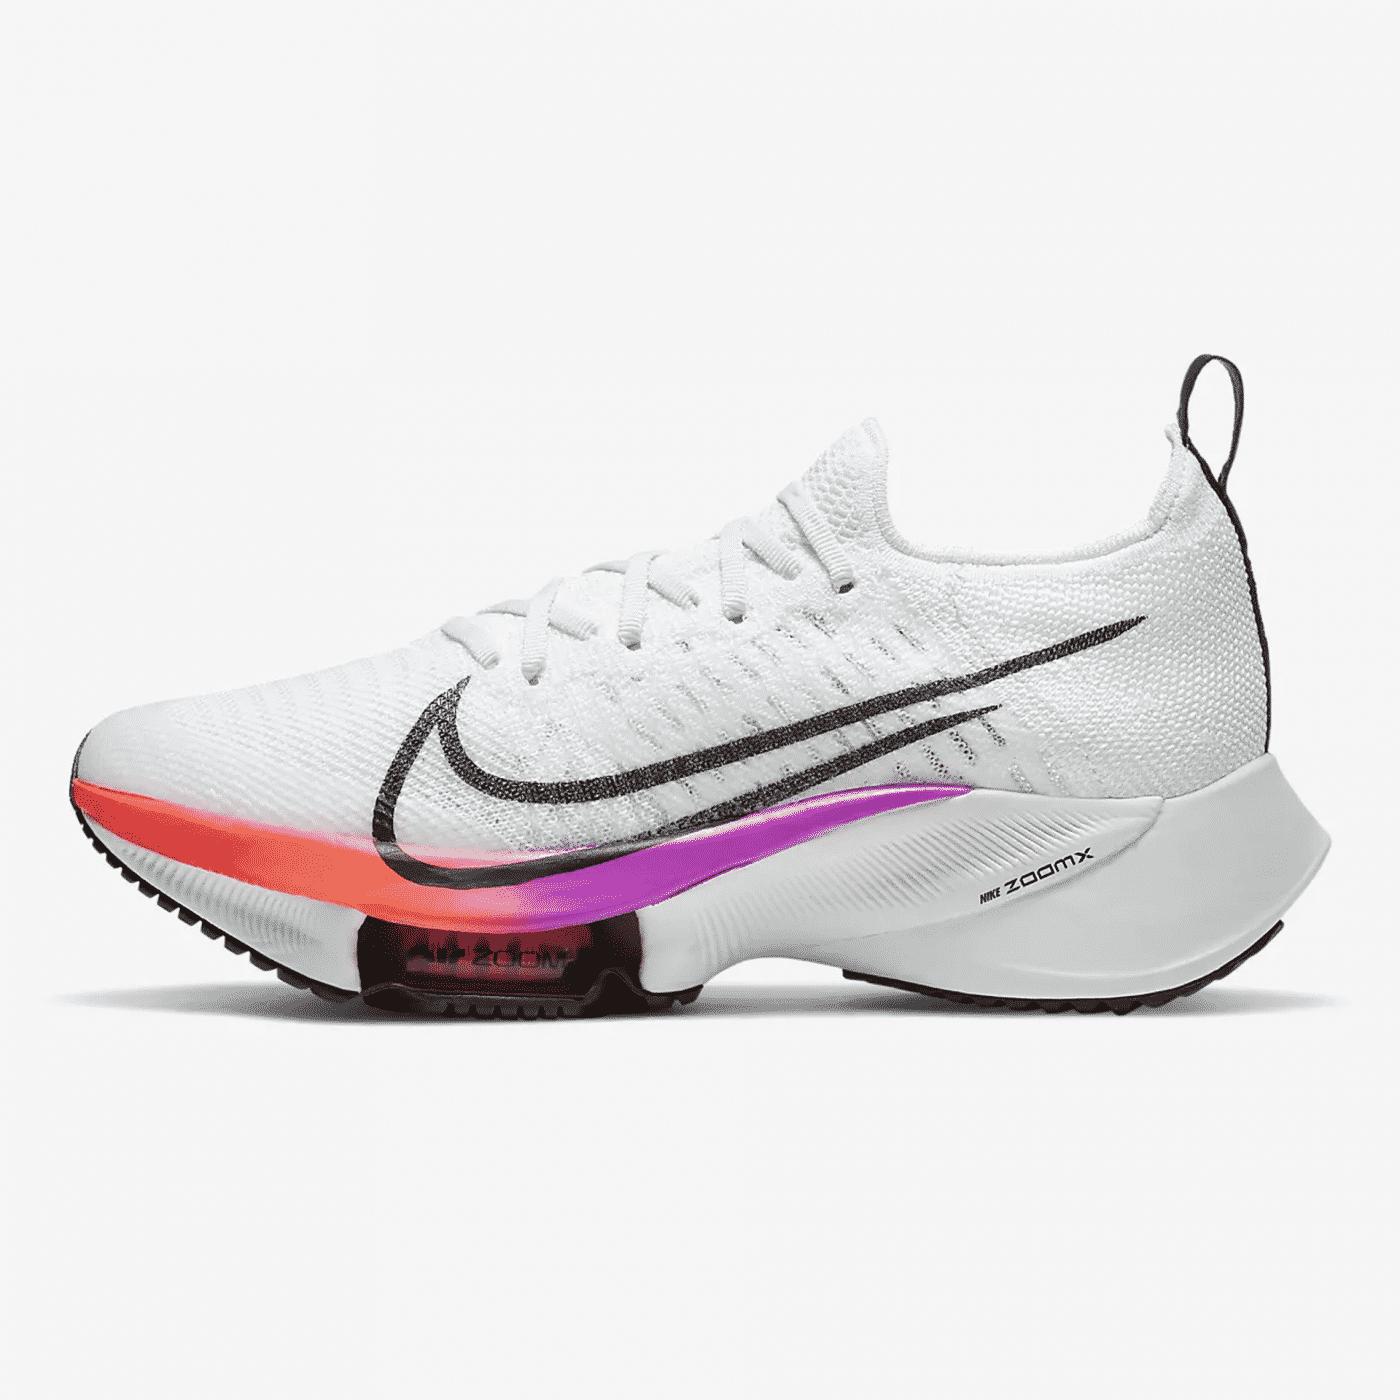 Nike-air-zoom-tempo-next-2